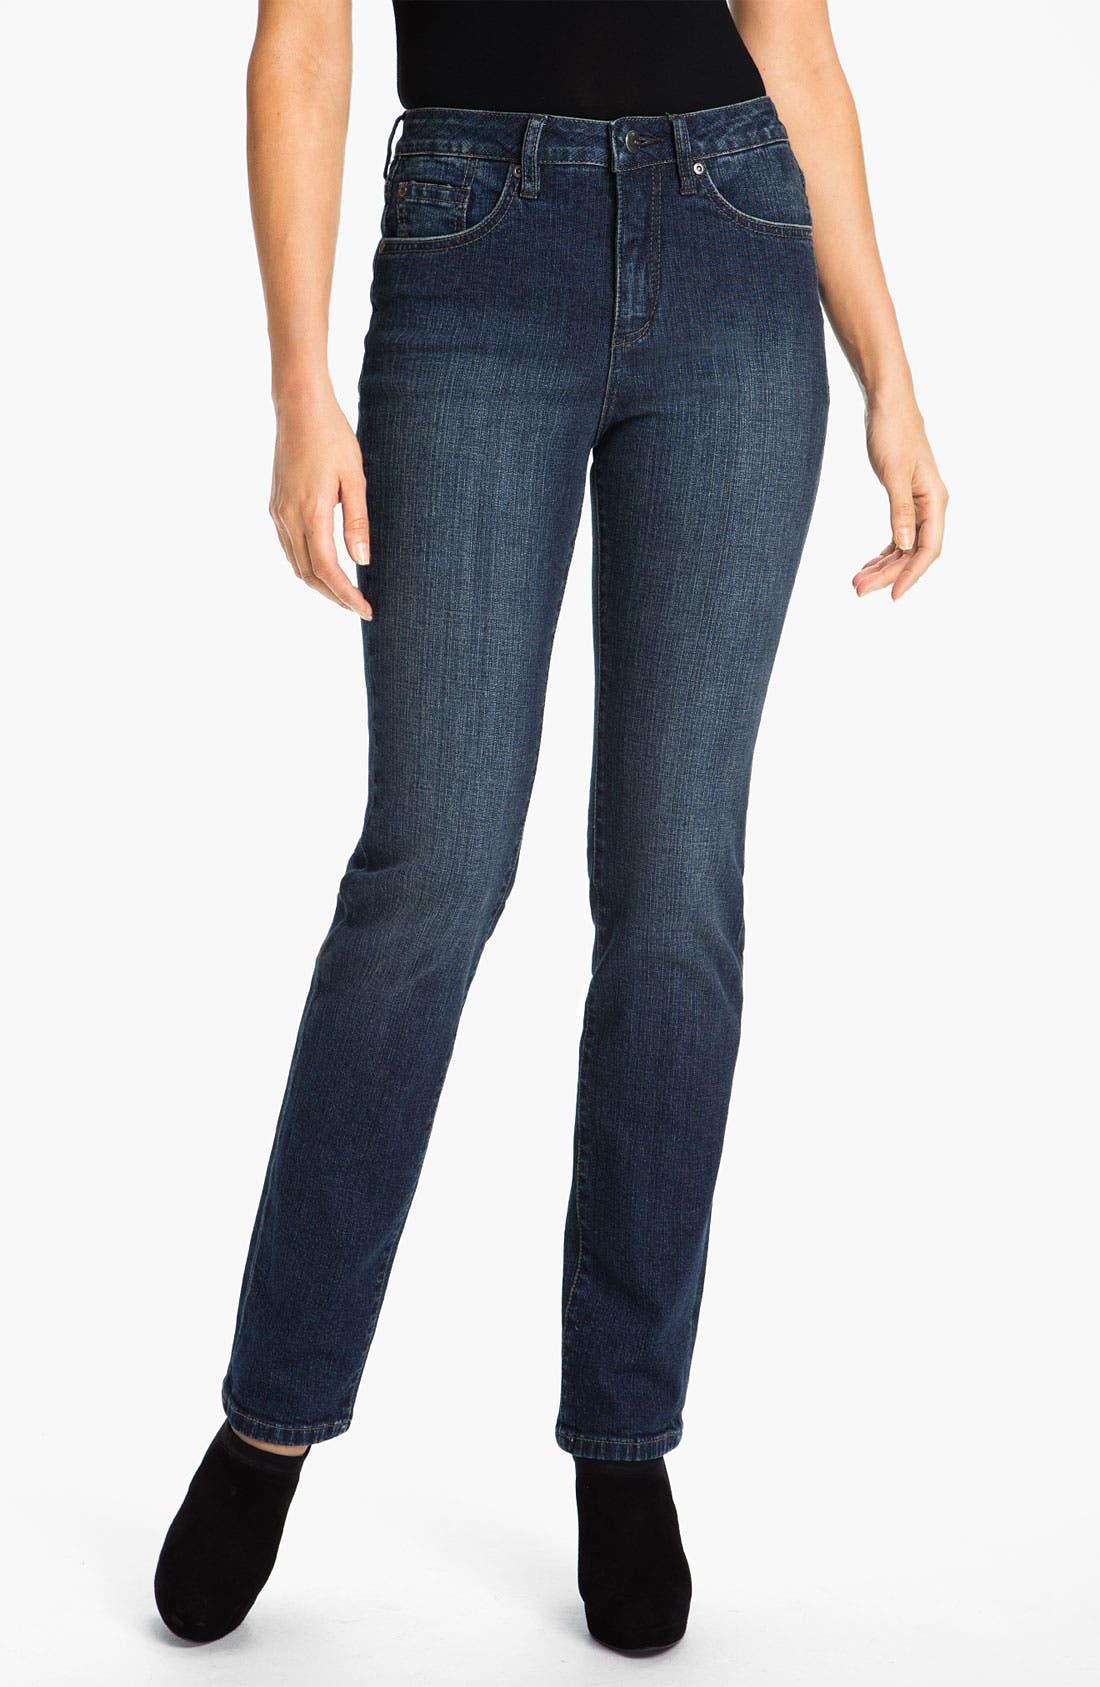 Alternate Image 1 Selected - Jag Jeans 'Sydney' Straight Leg Jeans (Billie Blue) (Petite)